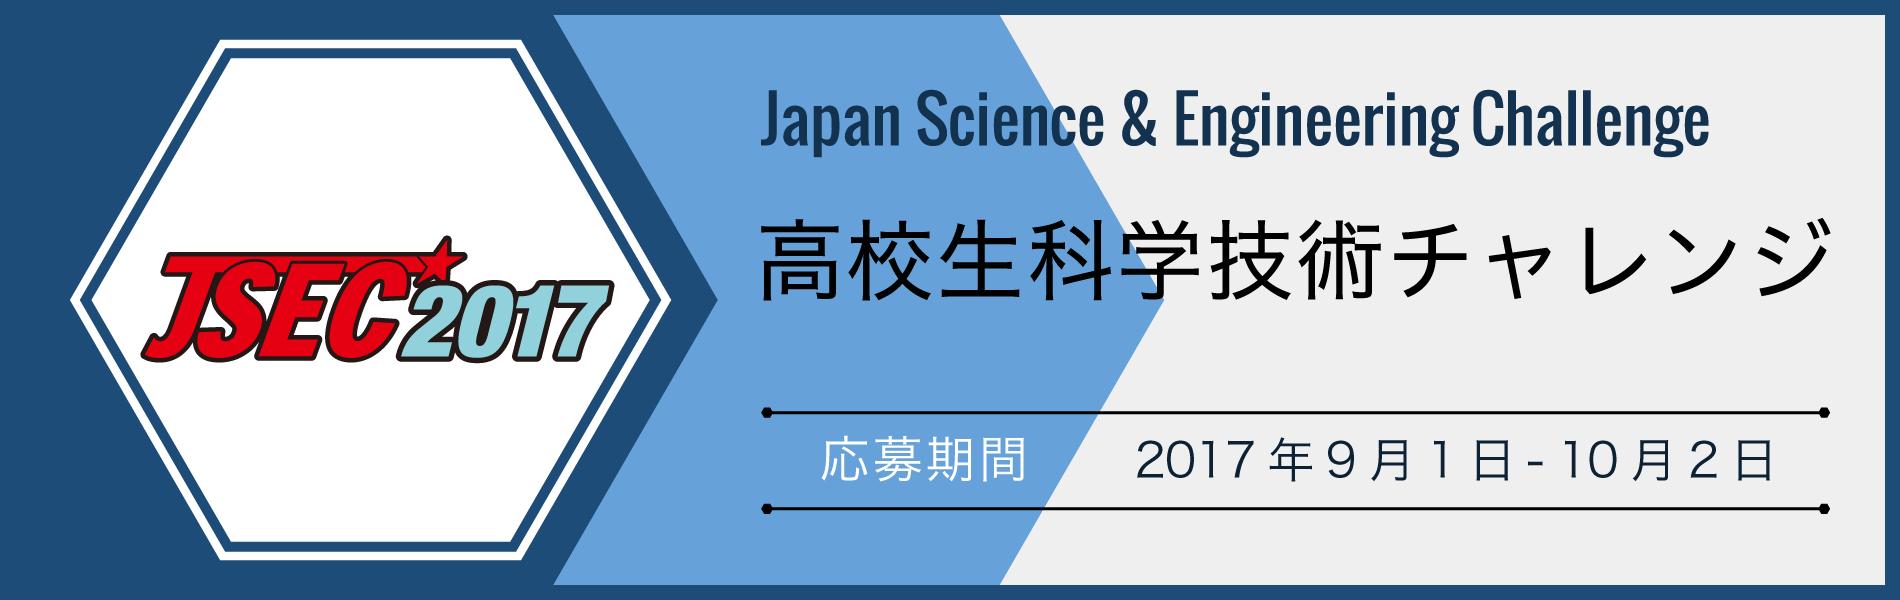 Japan Science & Engineering challenge 高校生科学技術チャレンジ 応募期間 2017年9月1日-10月2日